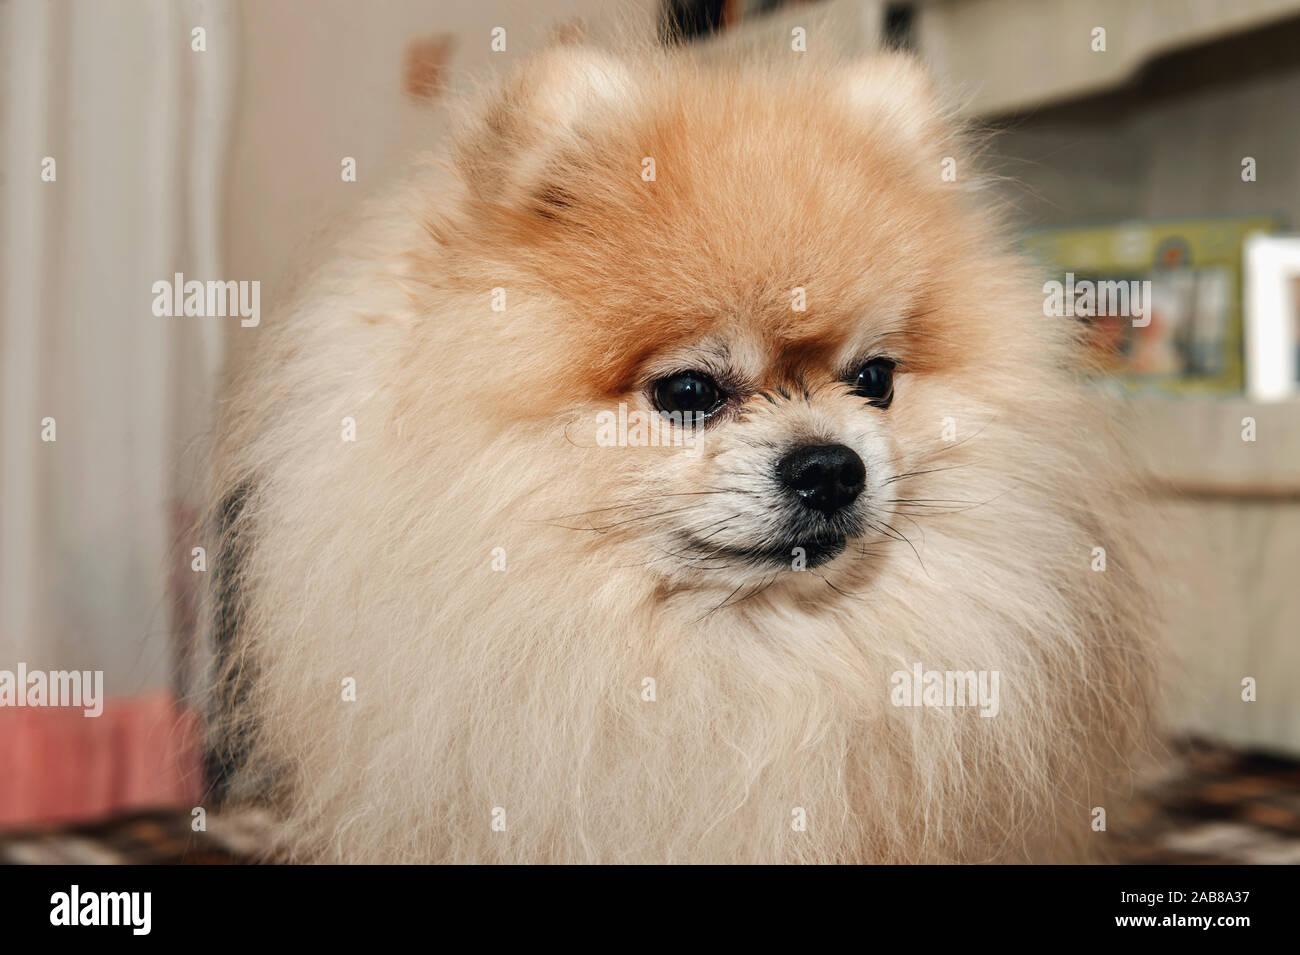 Pomeranian puppy dog before haircut long hair style, cute pet